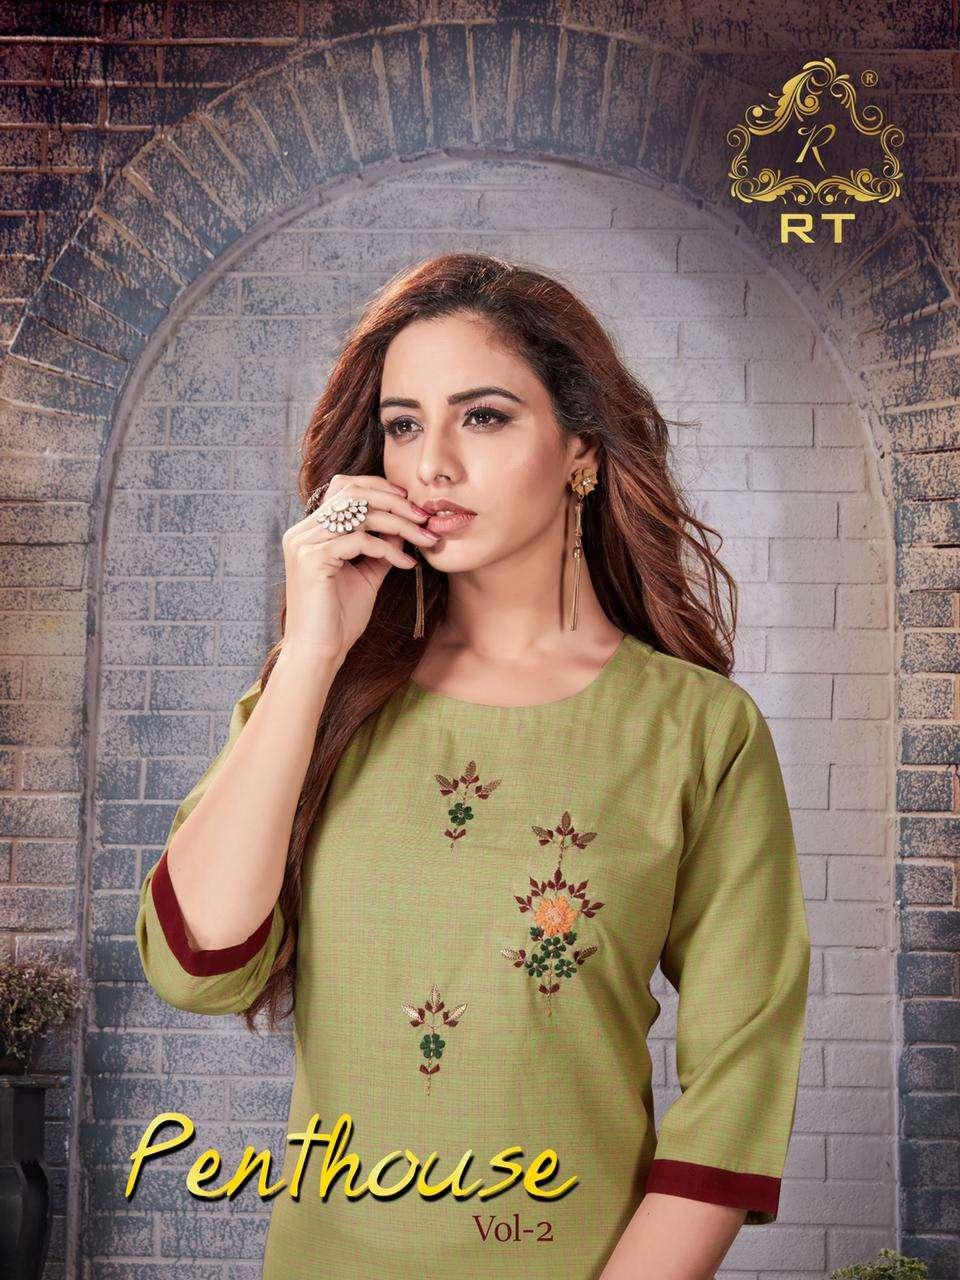 rijiya trends penthouse vol 2 exclusive festive kurti with pant wholesaler in surat